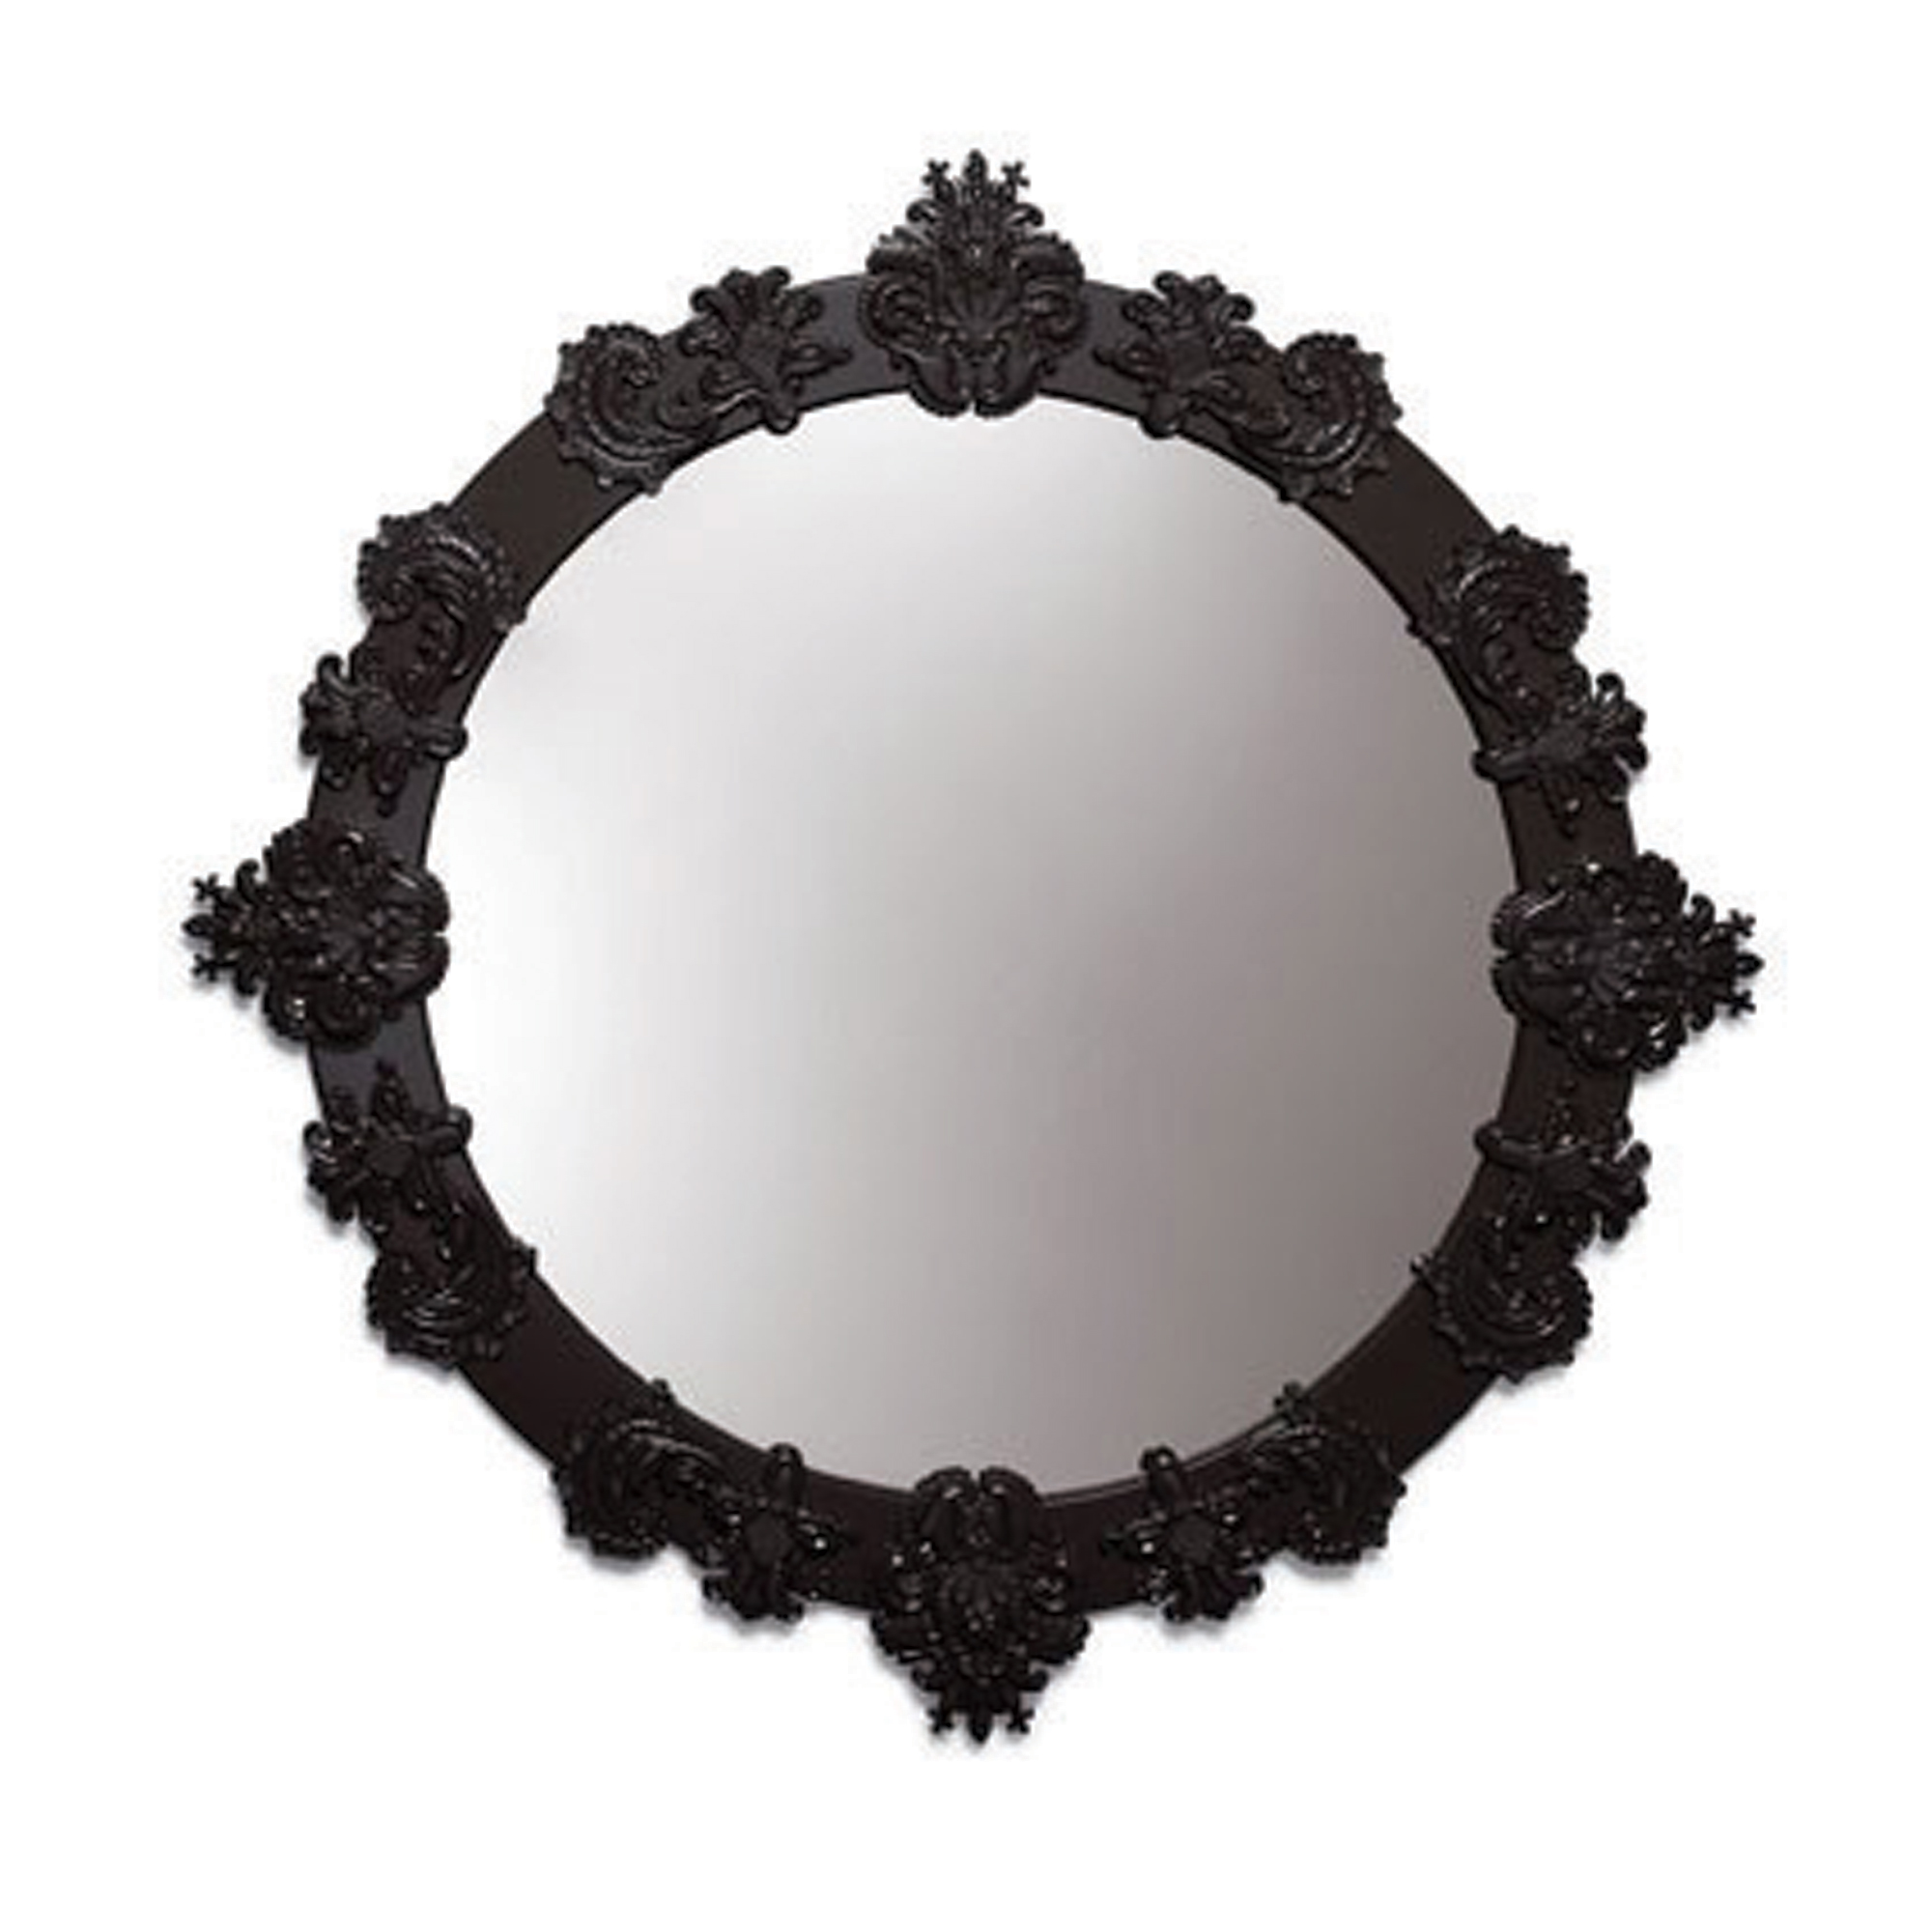 Round Mirror Large (Black) 01007790 - Lladro Functional Art